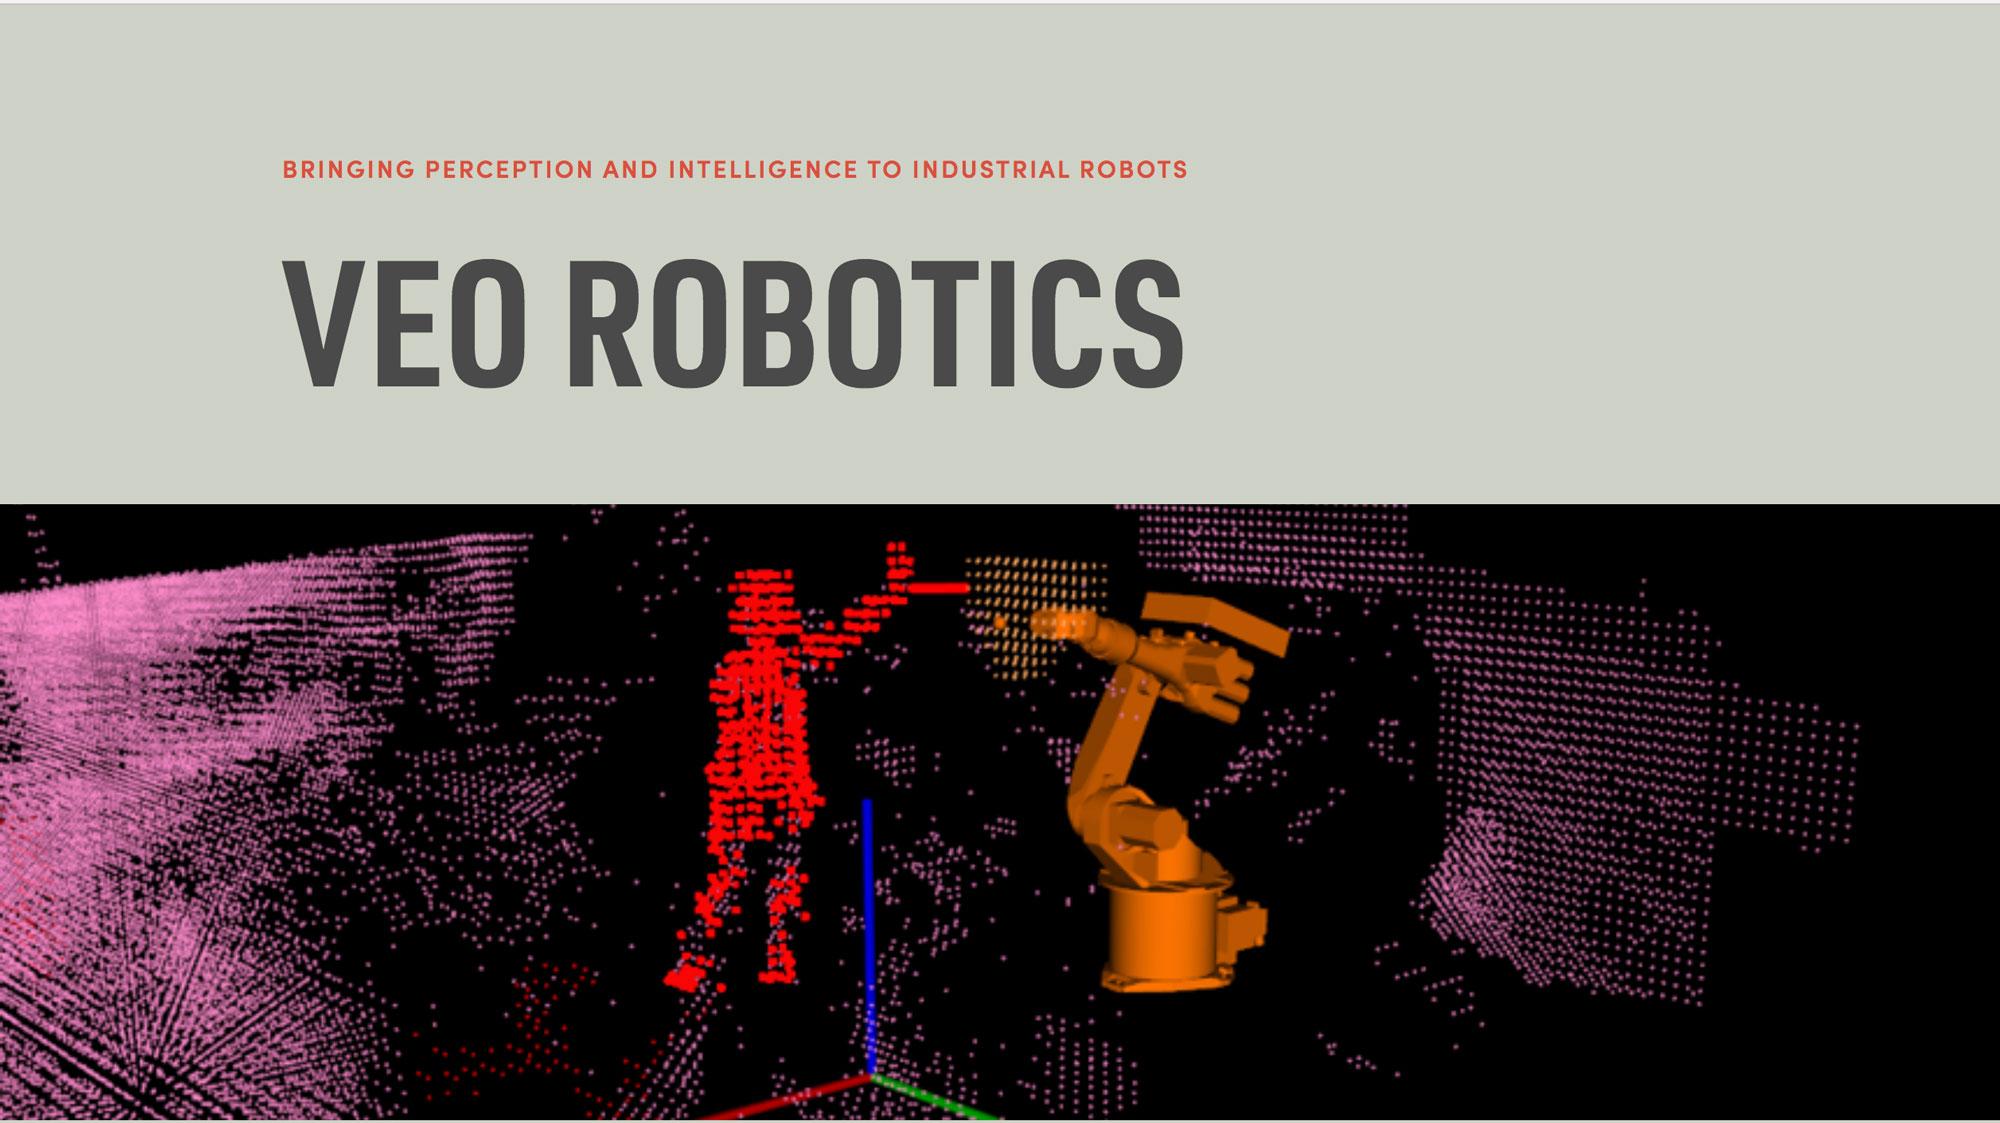 Squarespace website design by Caitilin McPhillips for Veo Robotics.